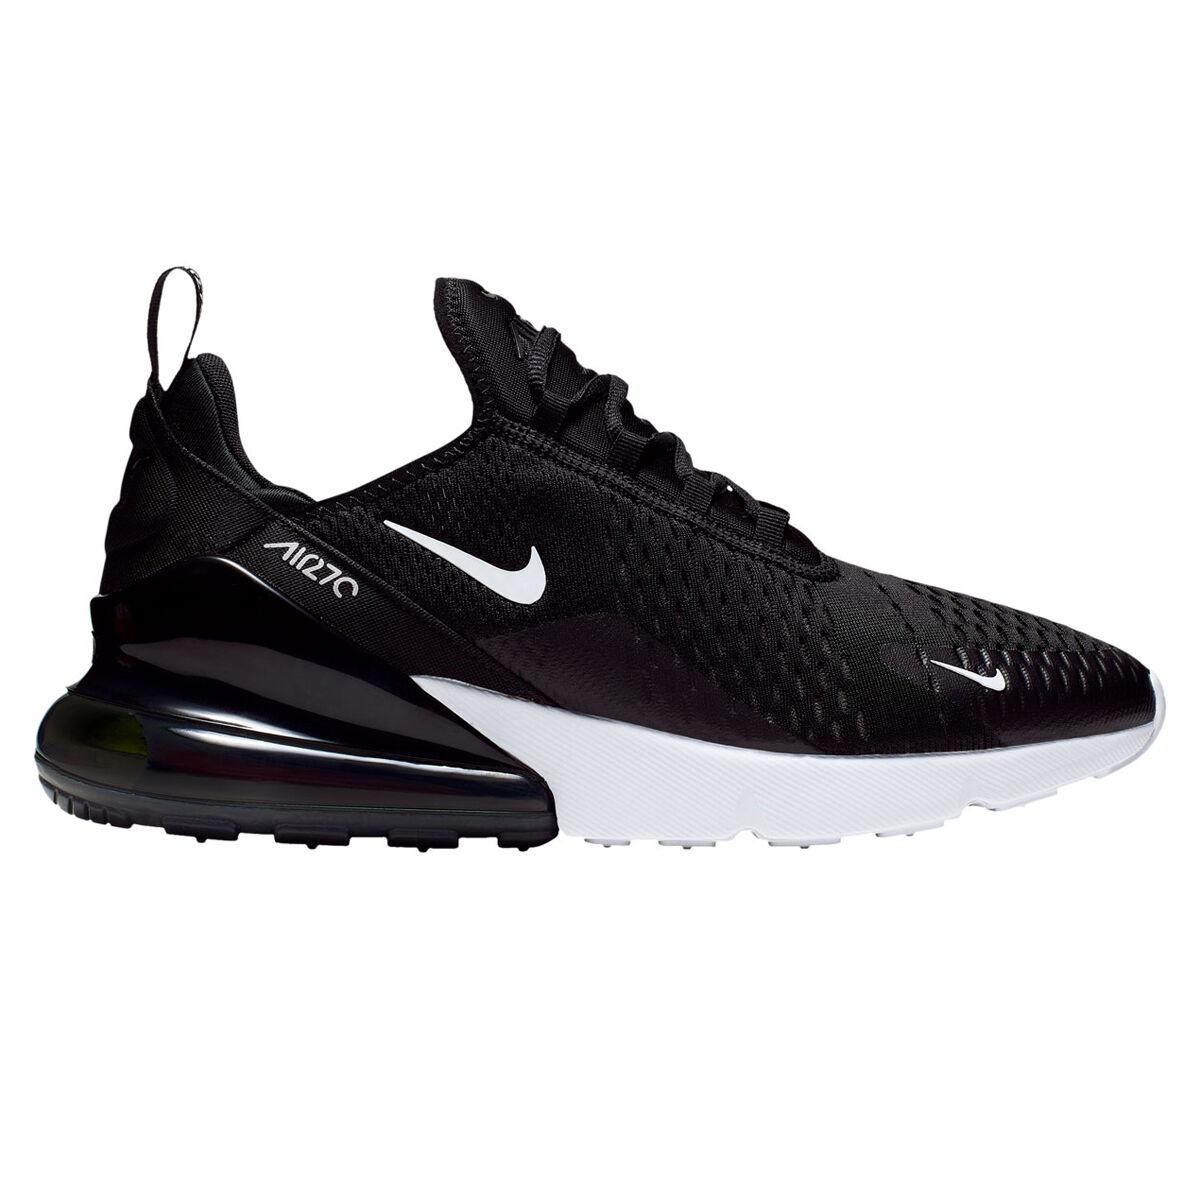 Nike Air Max 270 Mens Casual Shoes